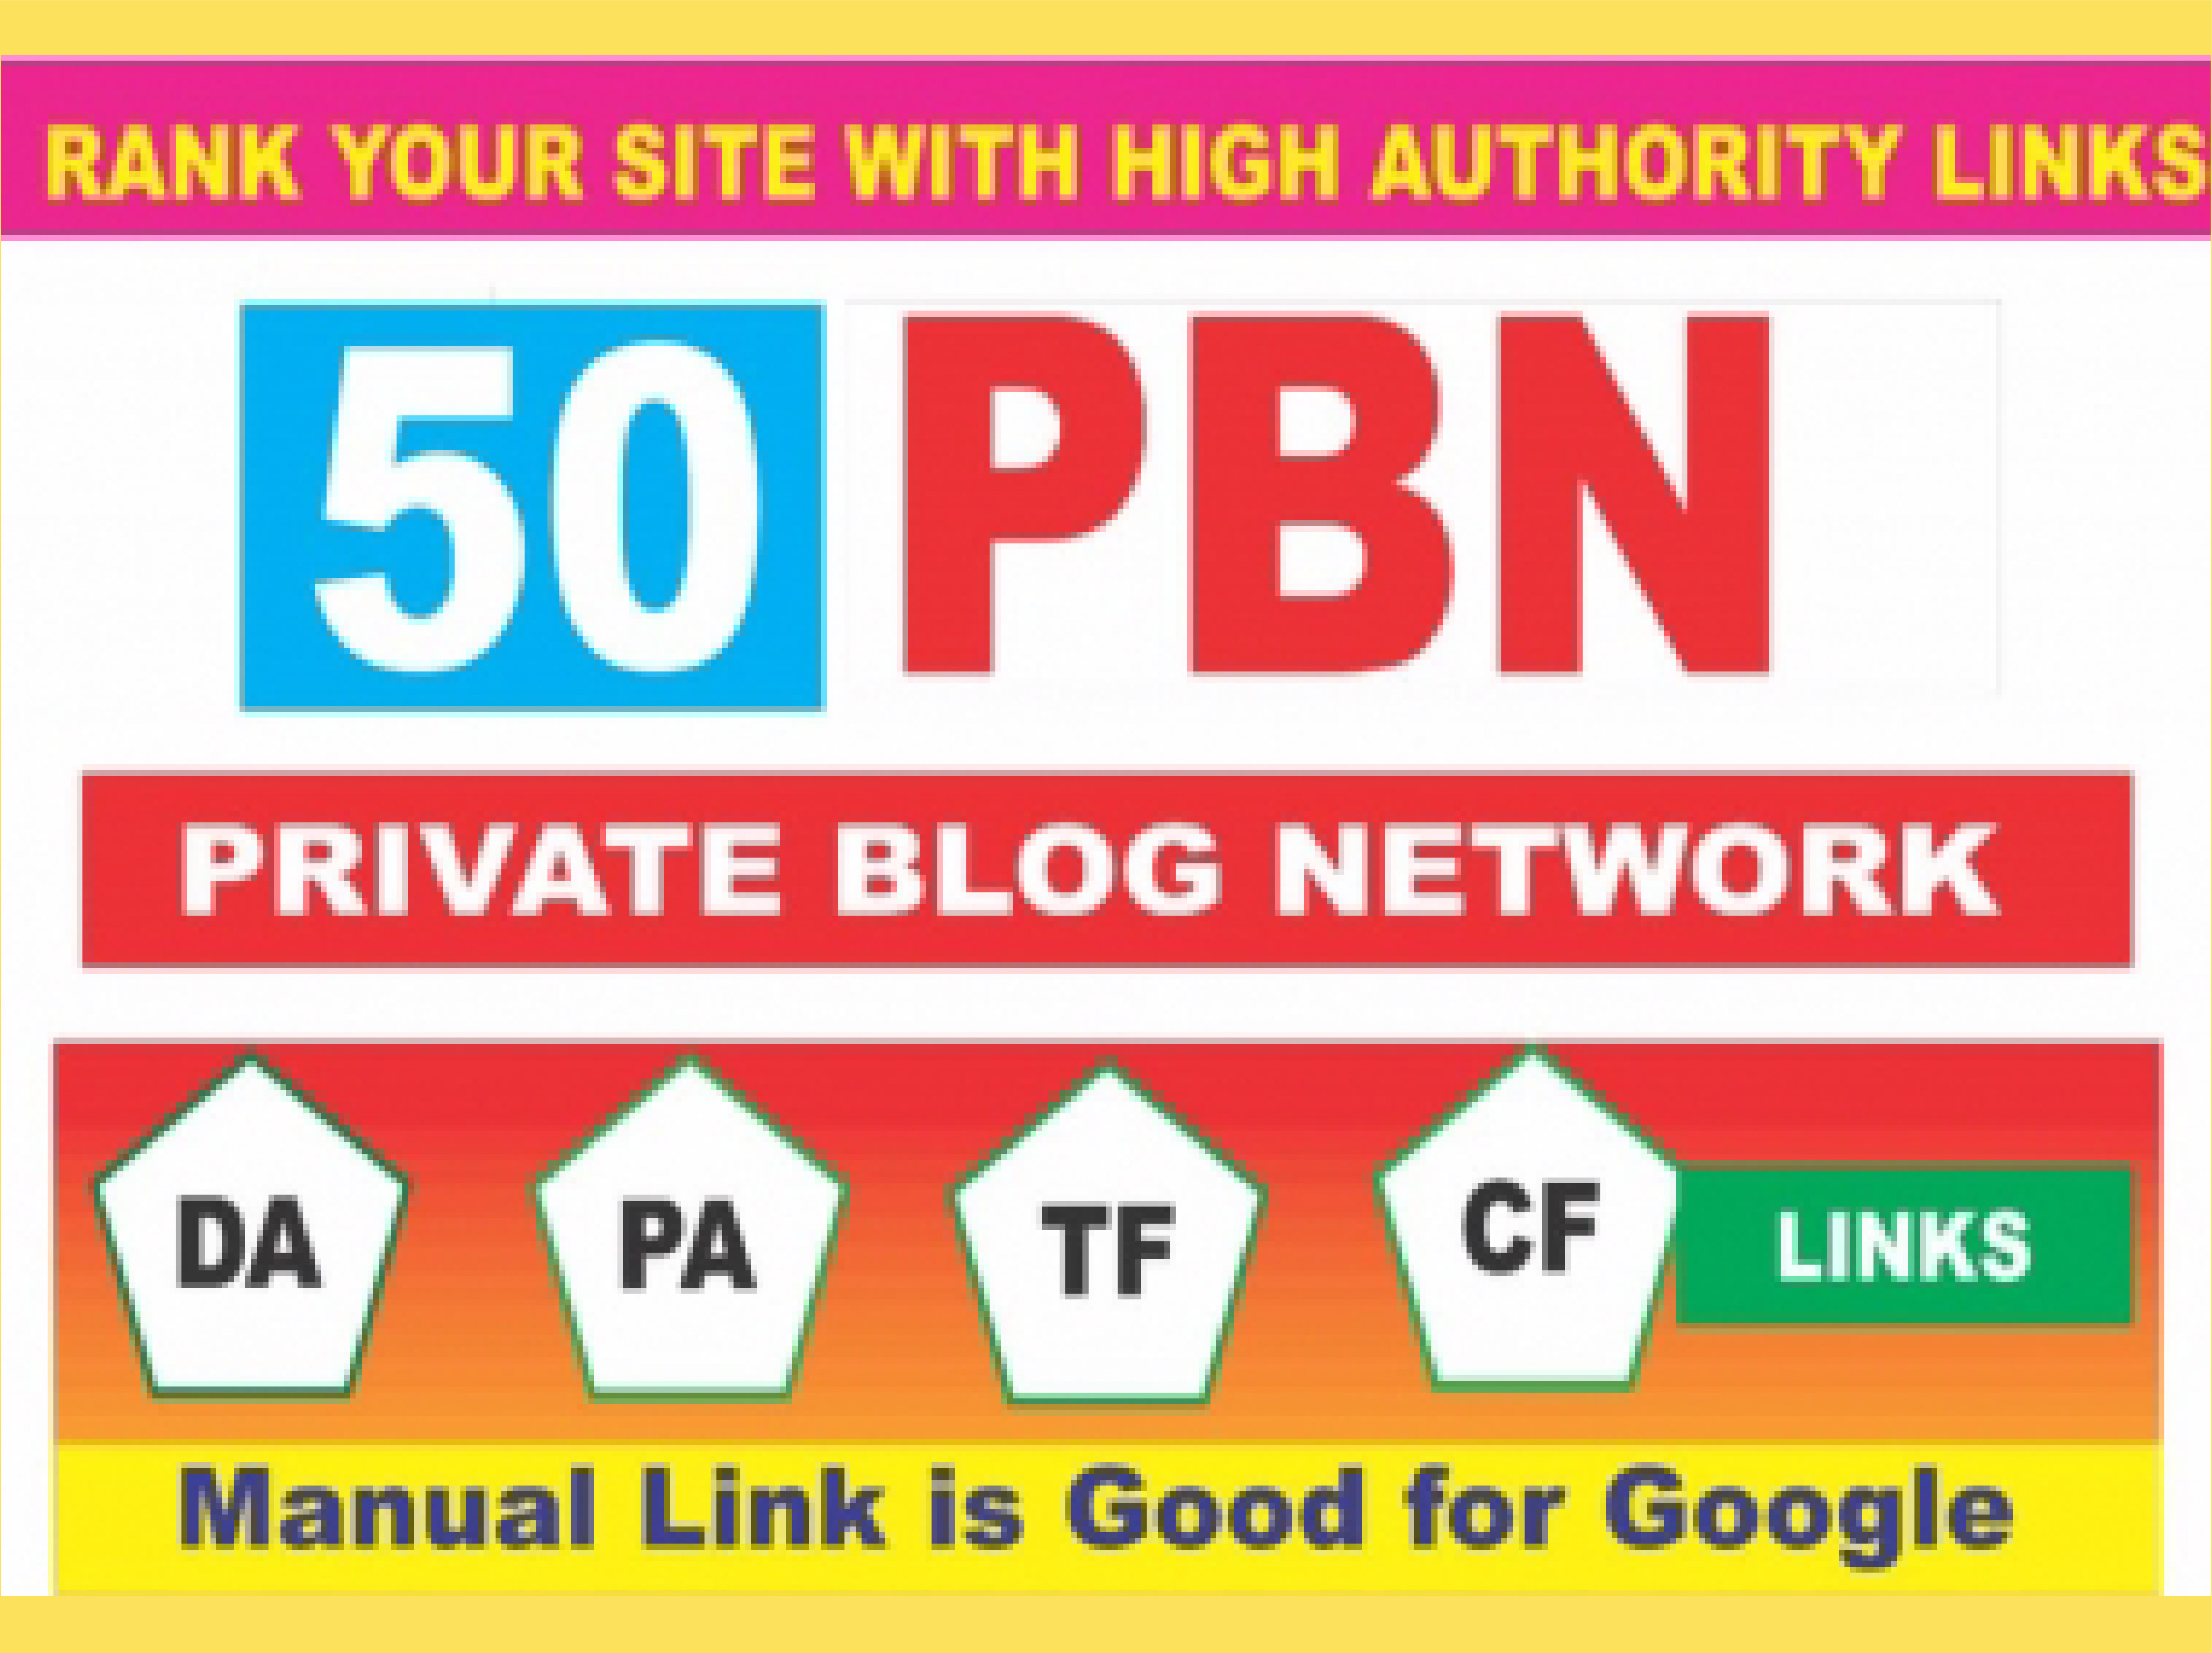 Create 50 High PA/DA TF/CF Homepage PBN Backlinks To Skyrocket you SERP